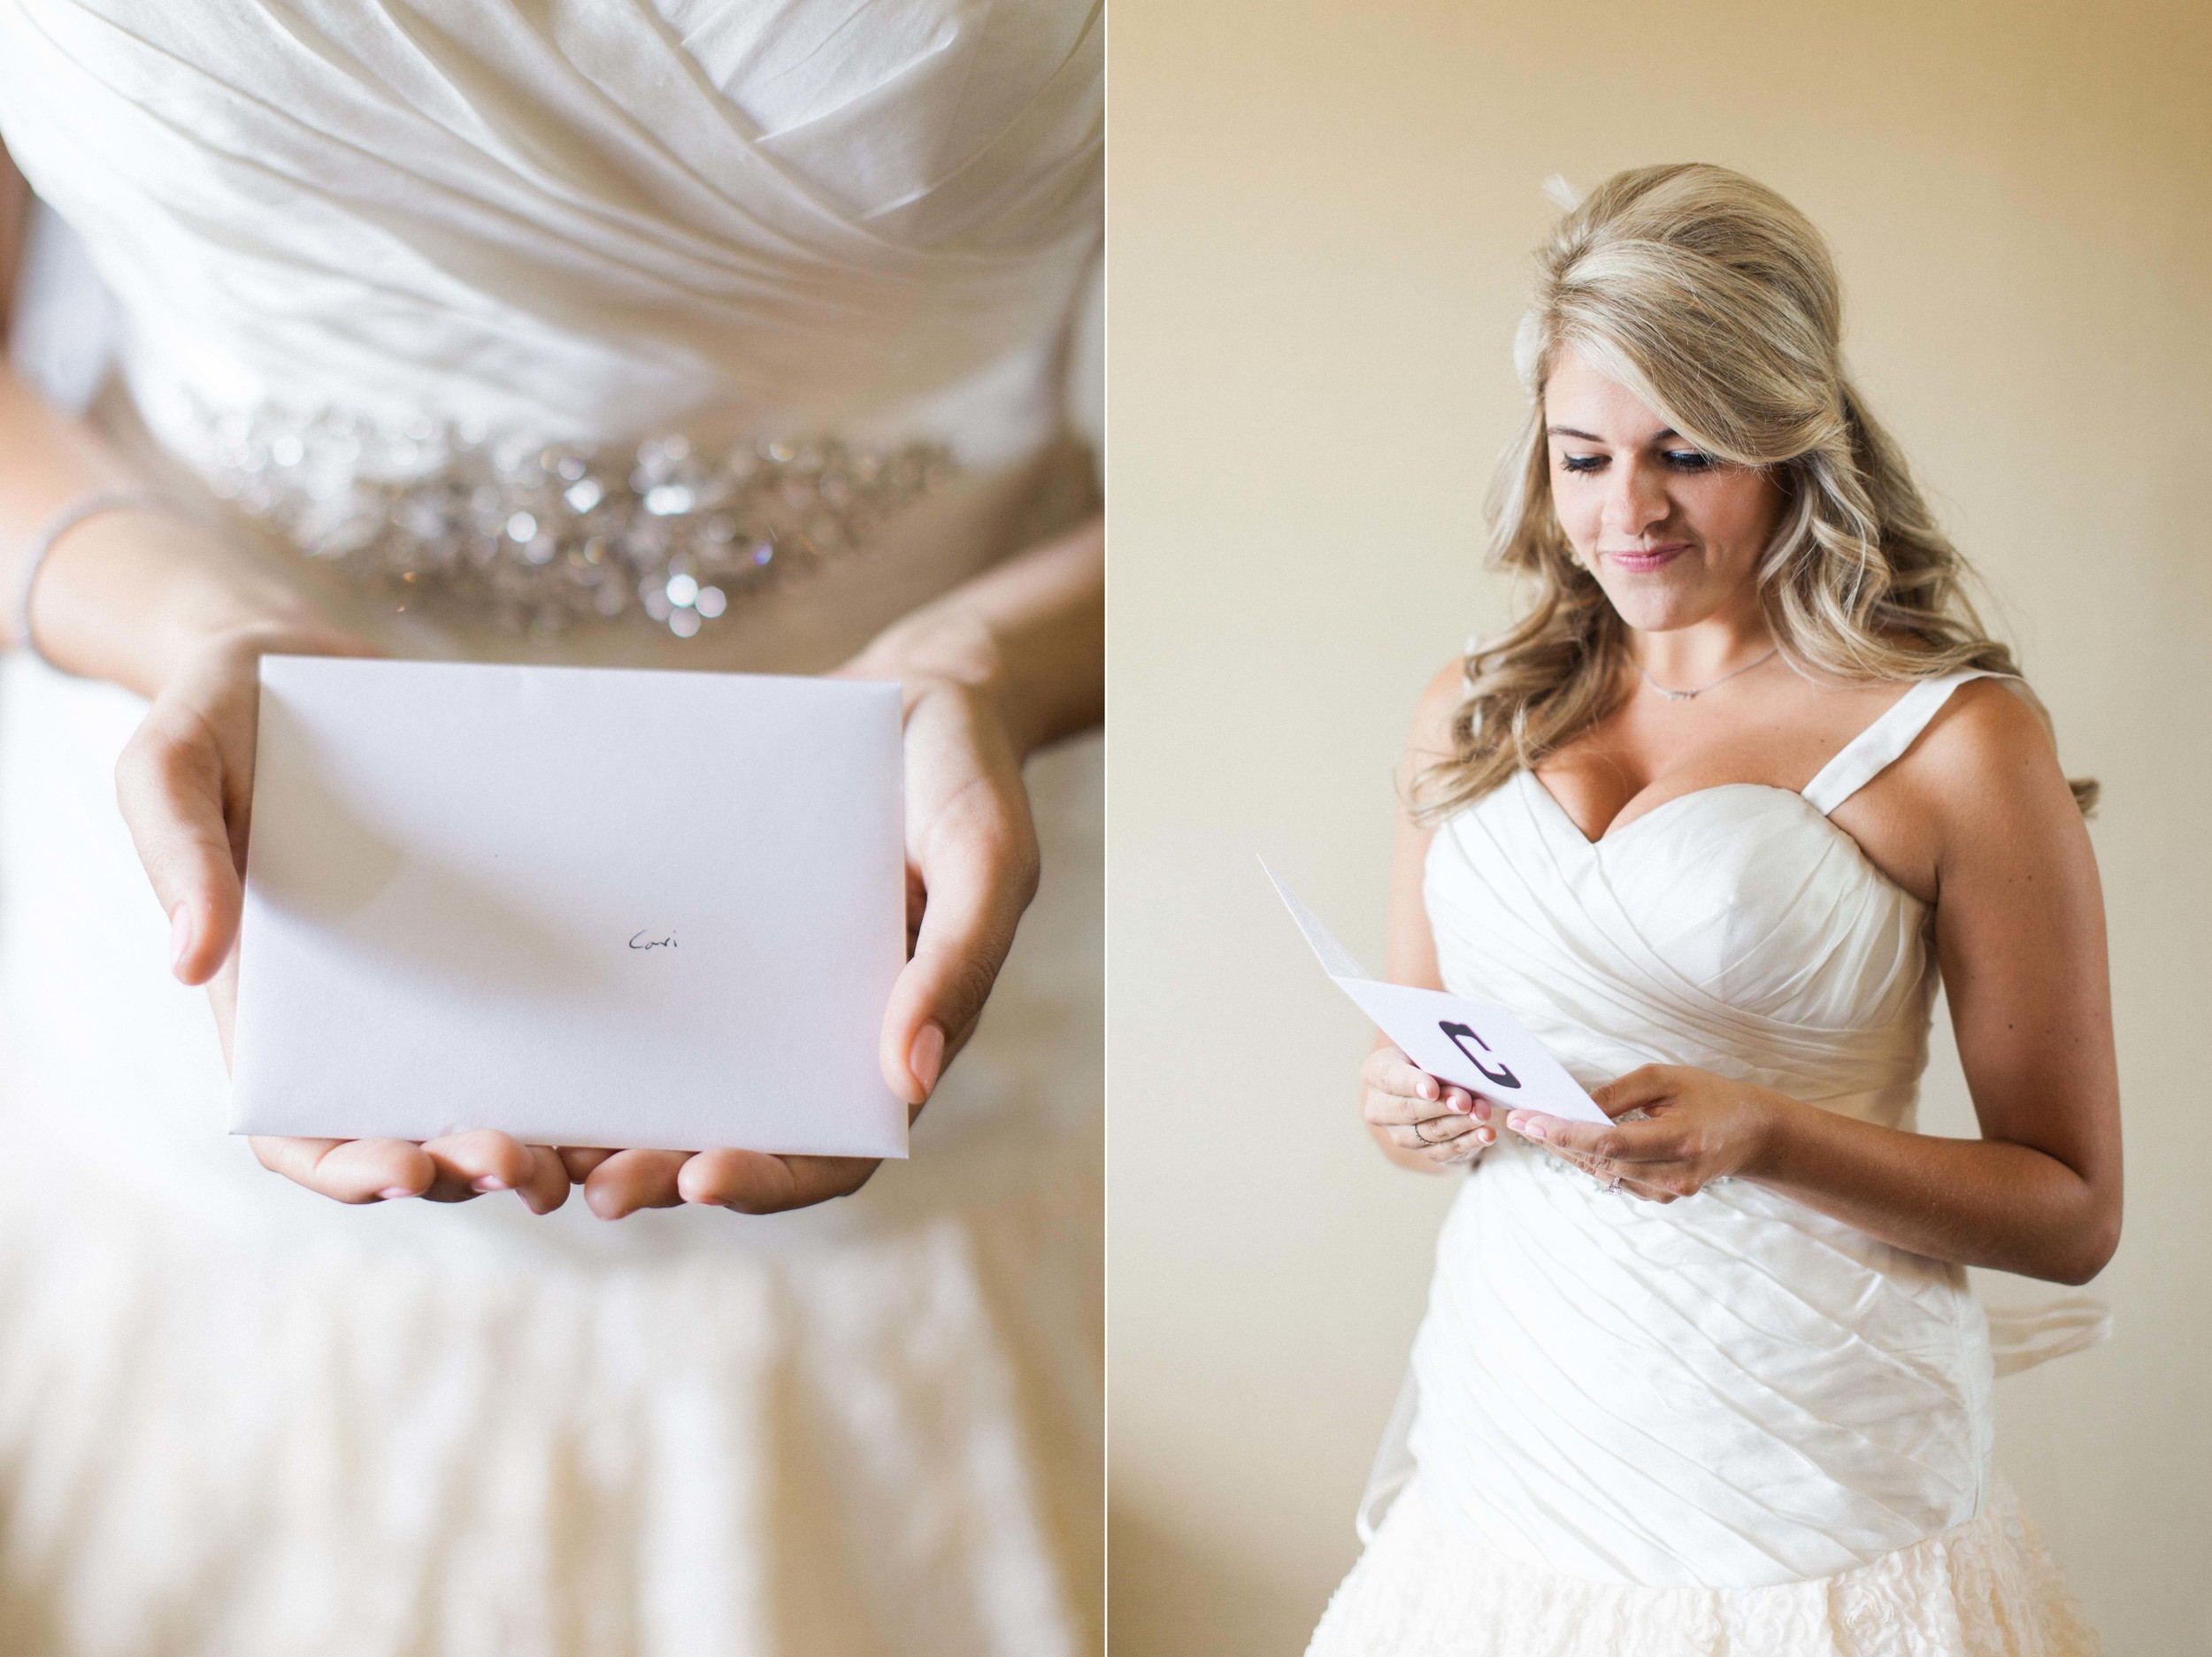 Chase Park Plaza St Louis Wedding Photo-1031 copy.jpg